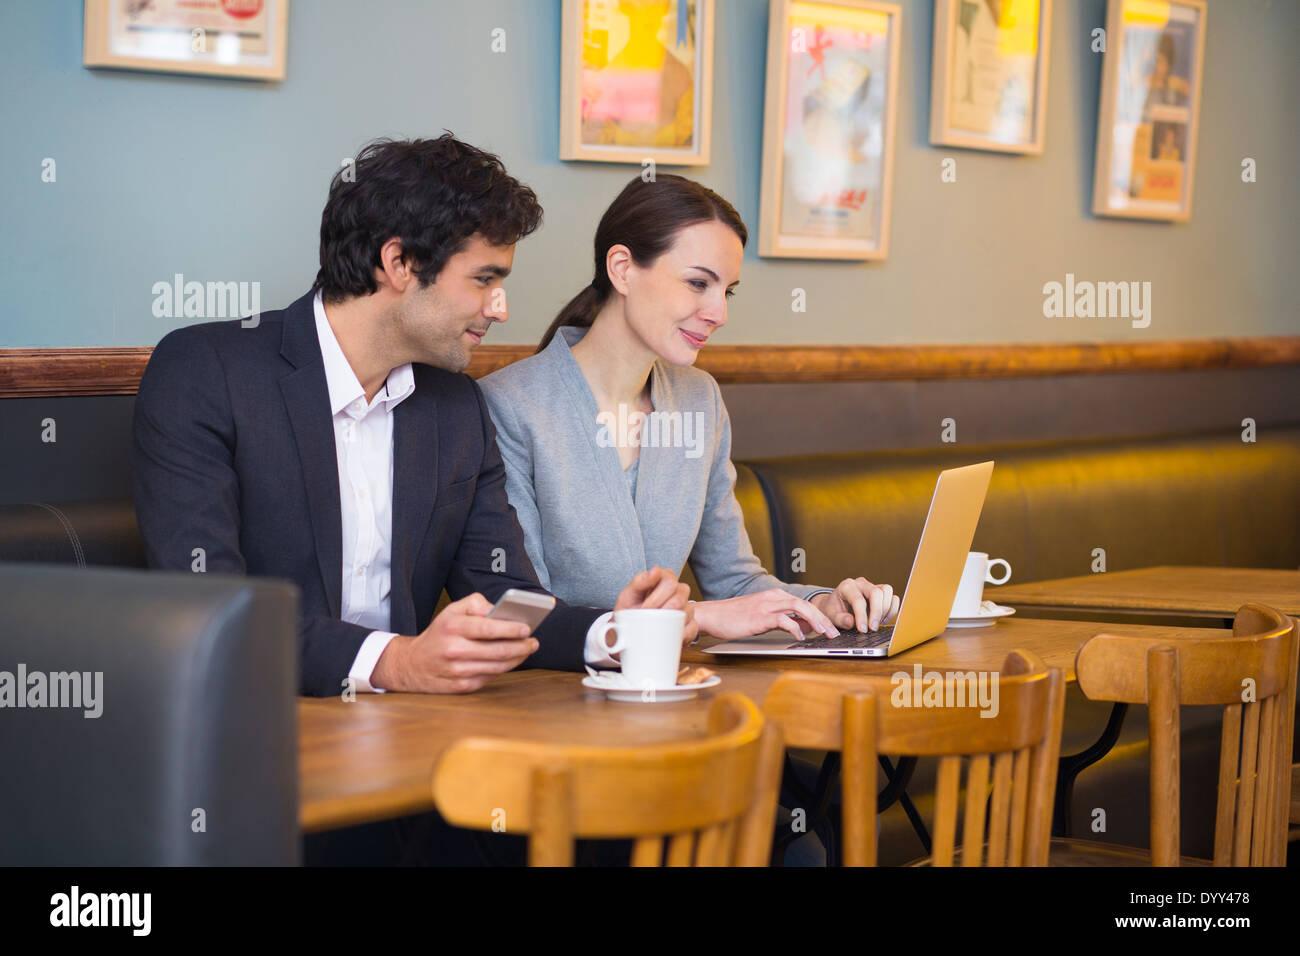 Business woman man computer colleague restaurant - Stock Image